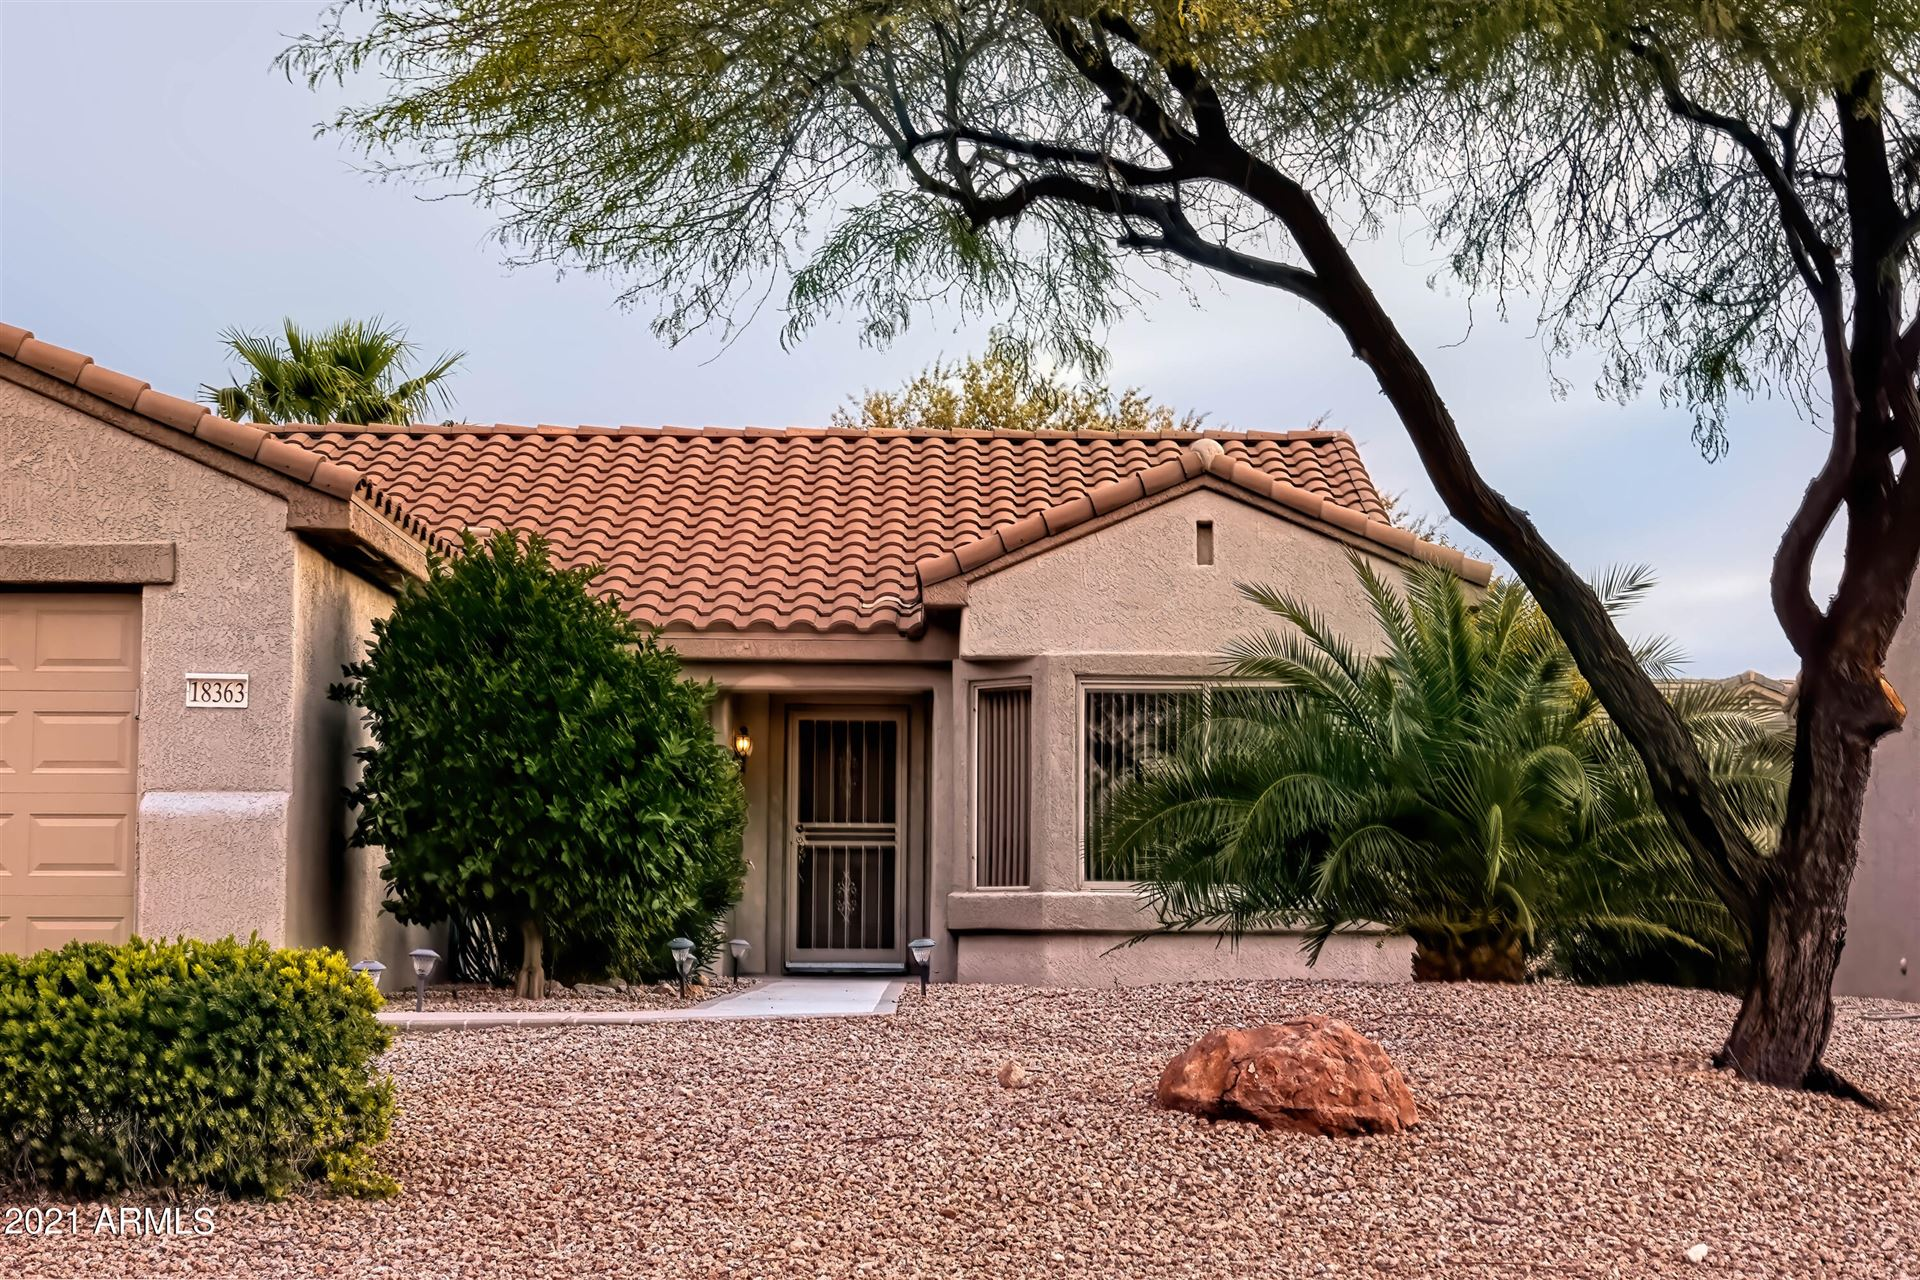 Photo of 18363 N AVALON Lane, Surprise, AZ 85374 (MLS # 6303714)